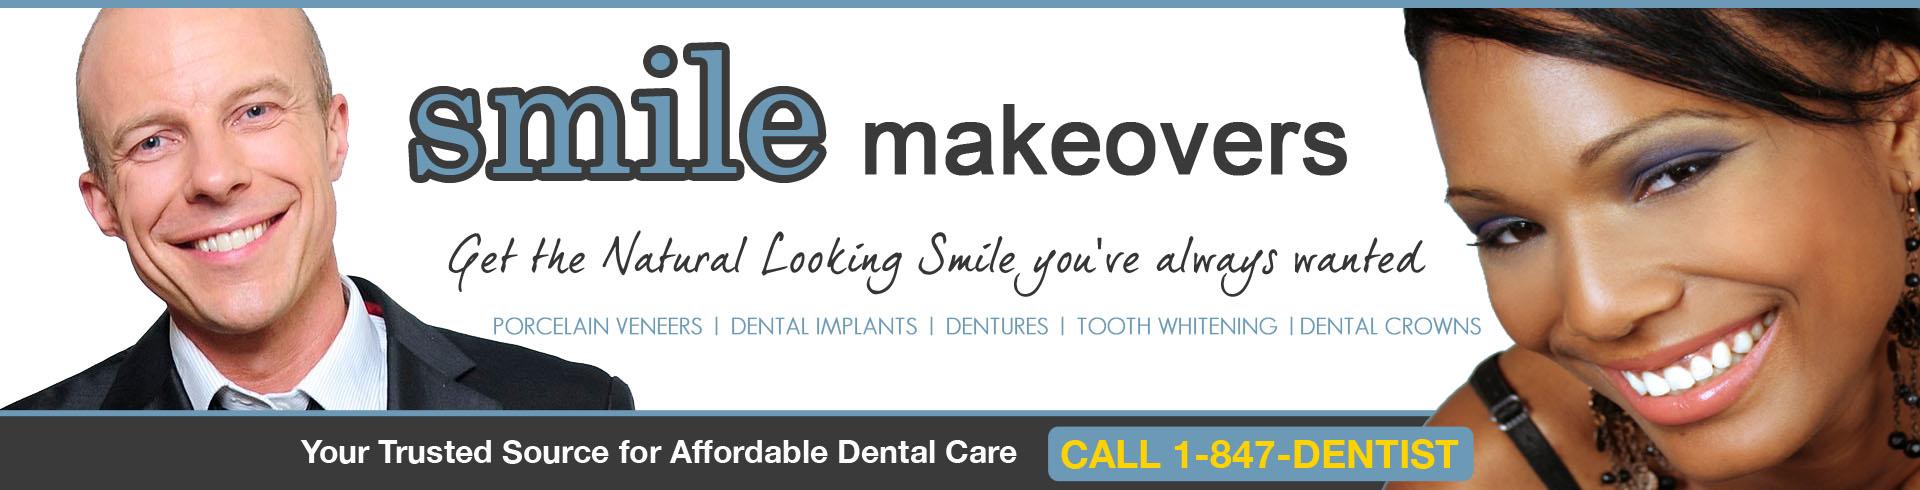 cosmetic dentist lake county il dental implants